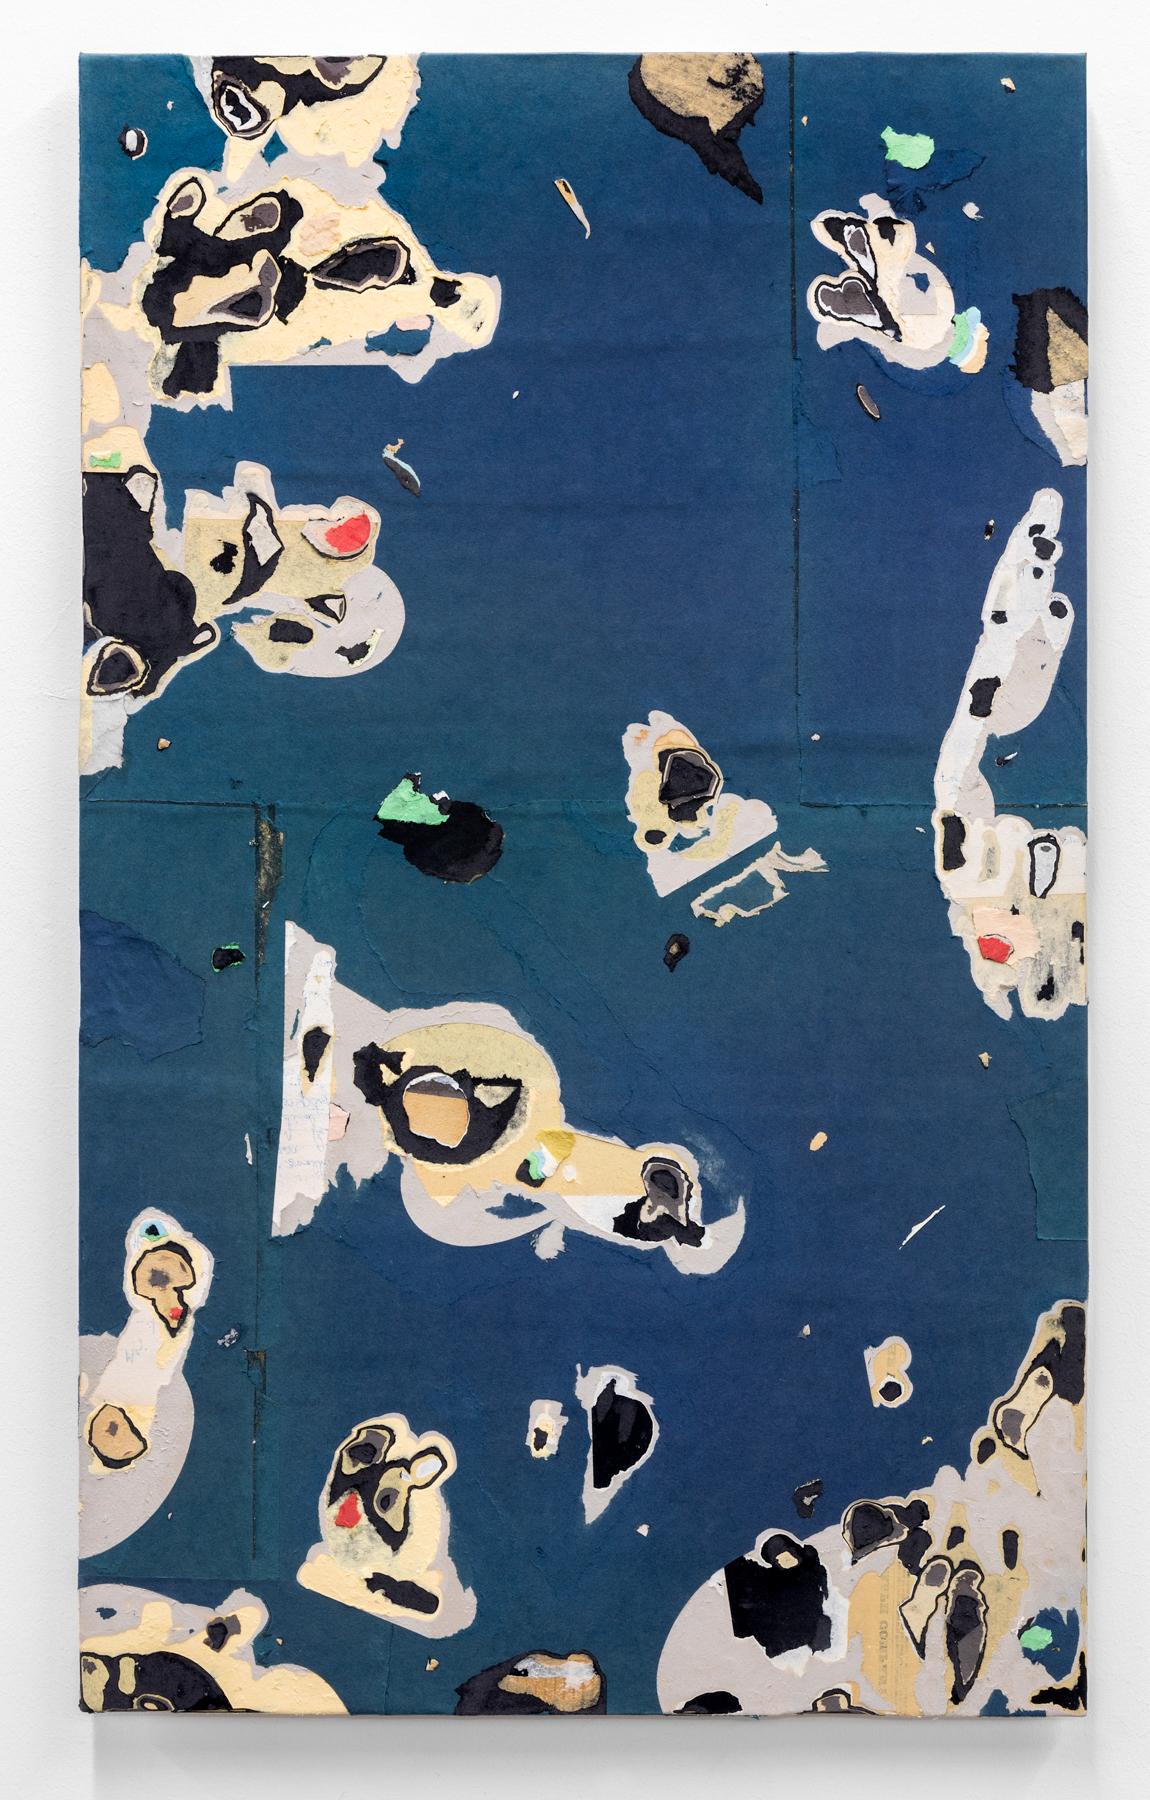 "Jacob Whibley, lonely rivers flow , 2017, ephemera paper on panel, 76 x 46 cm (30"" x 18.25"")"